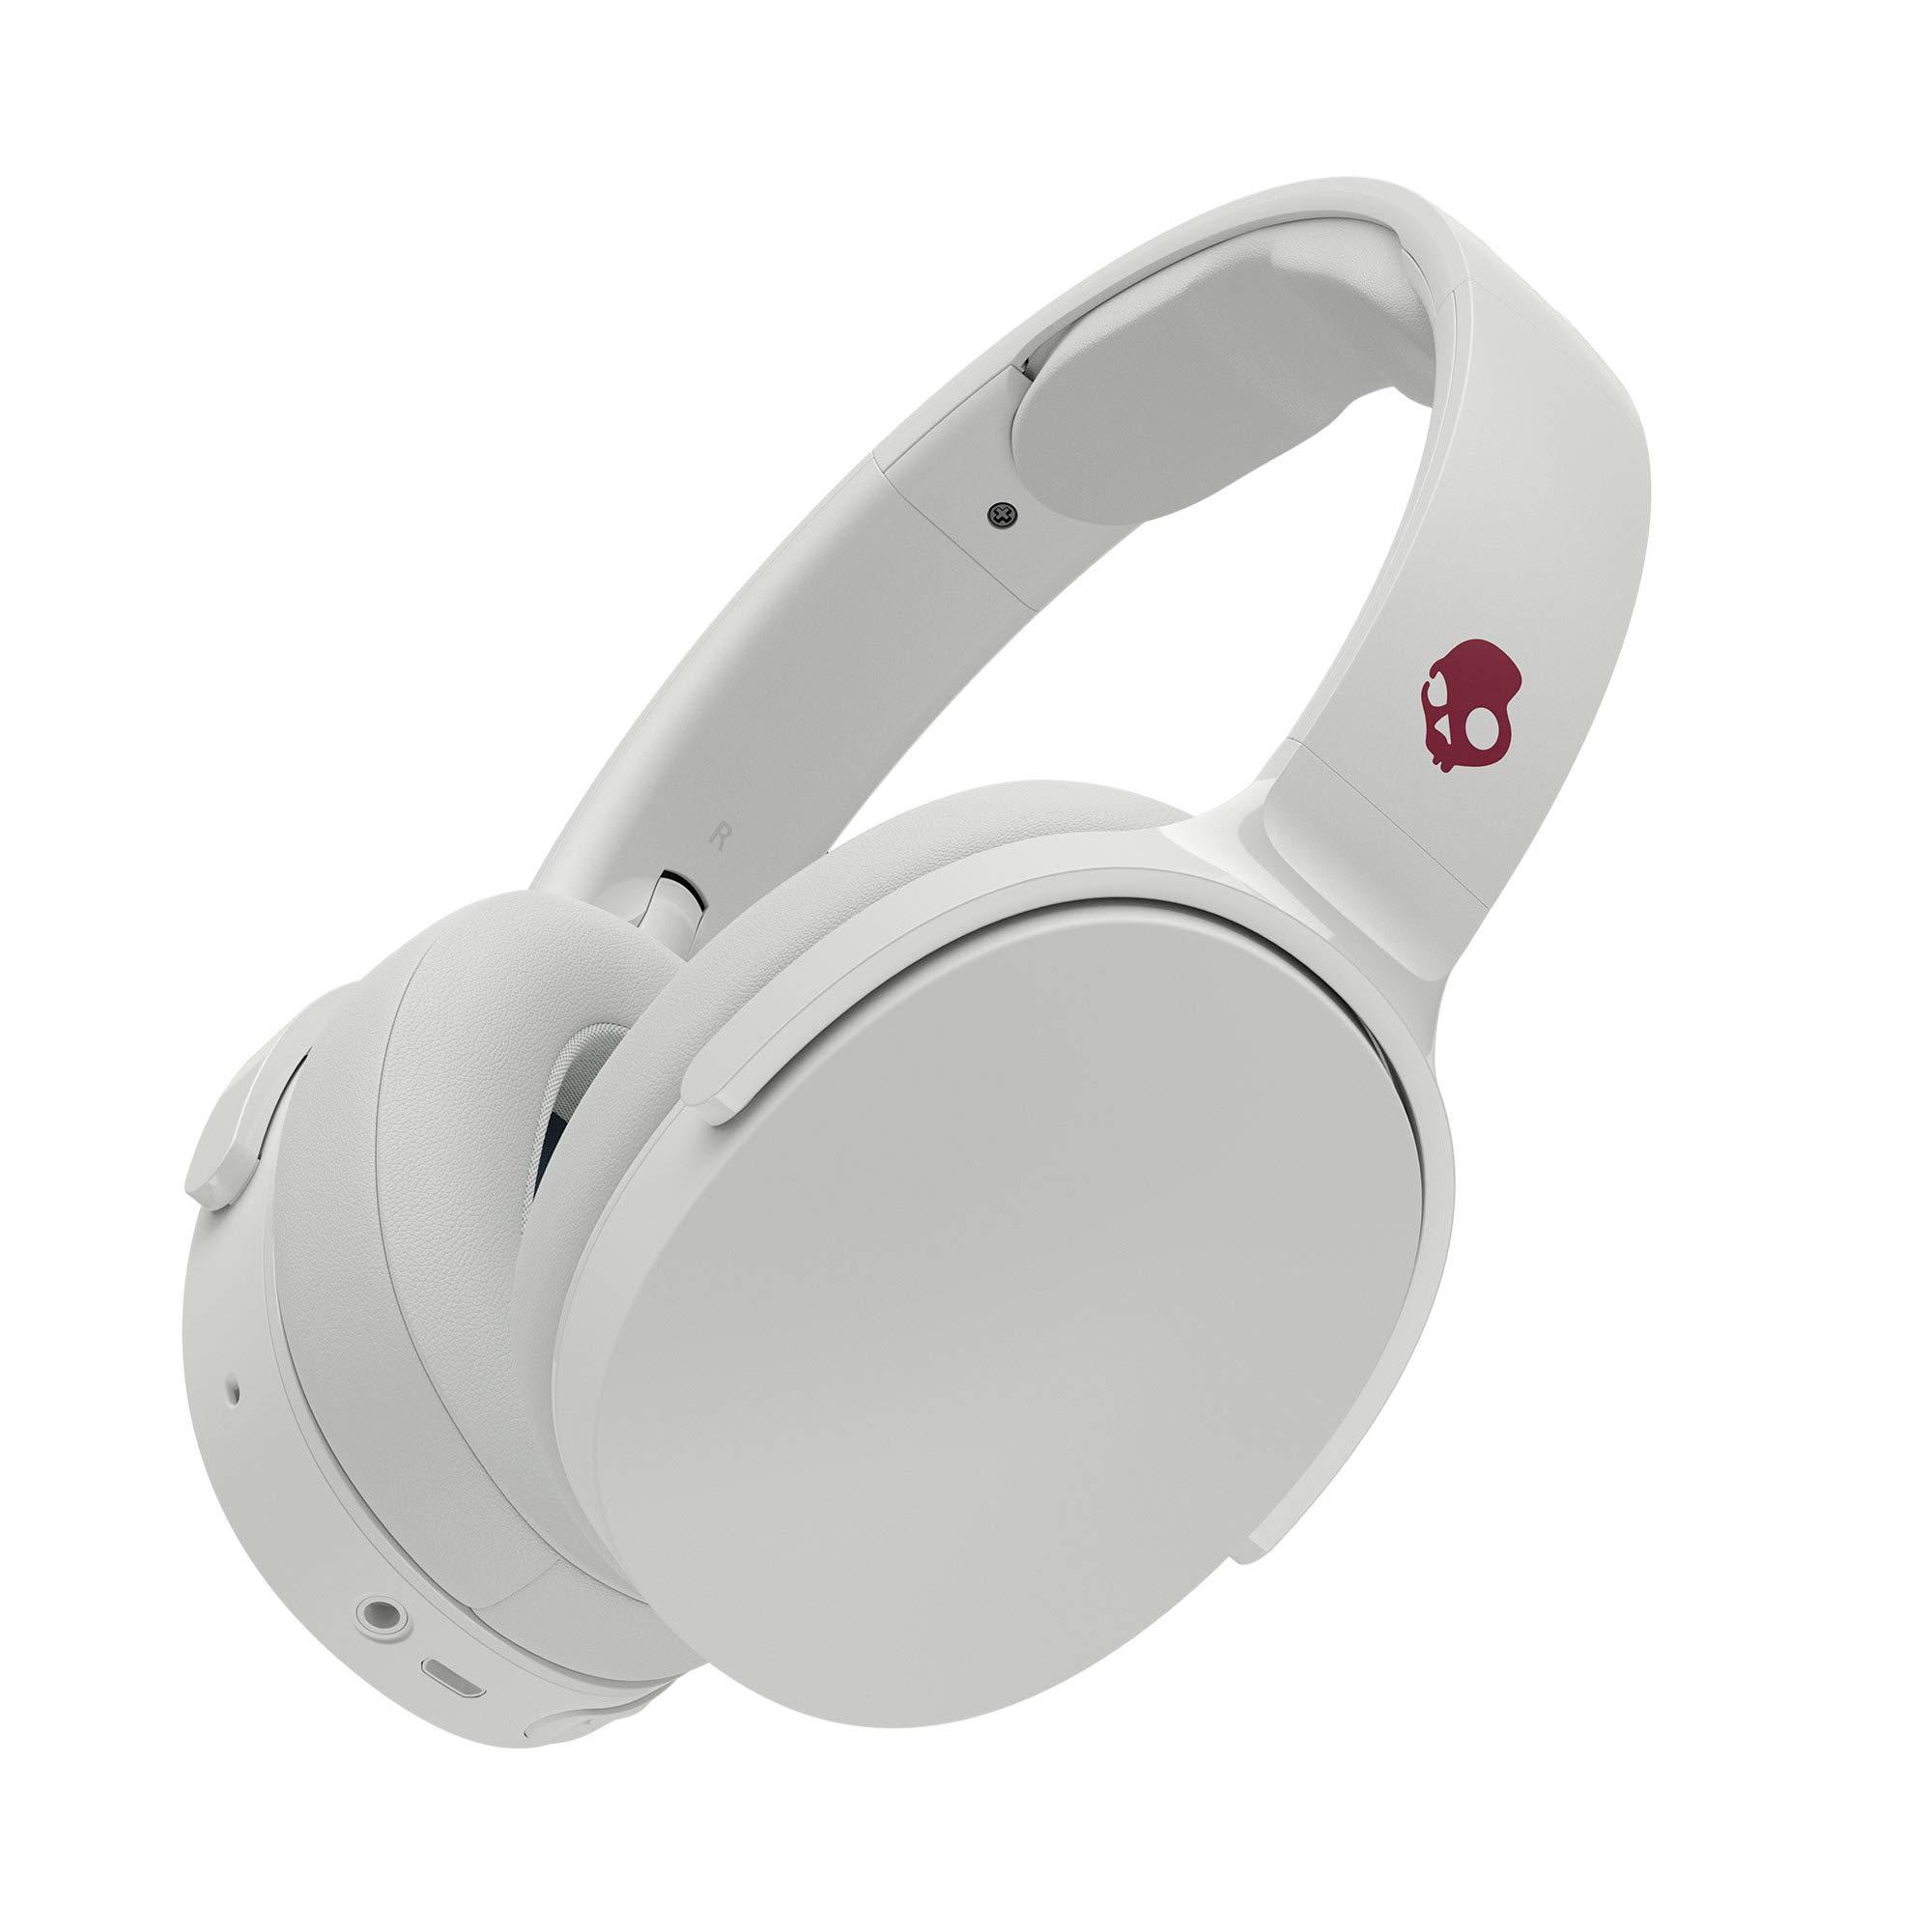 Auriculares Skullcandy Hesh 3 Bluetooth Inalambrico O (VK4S)